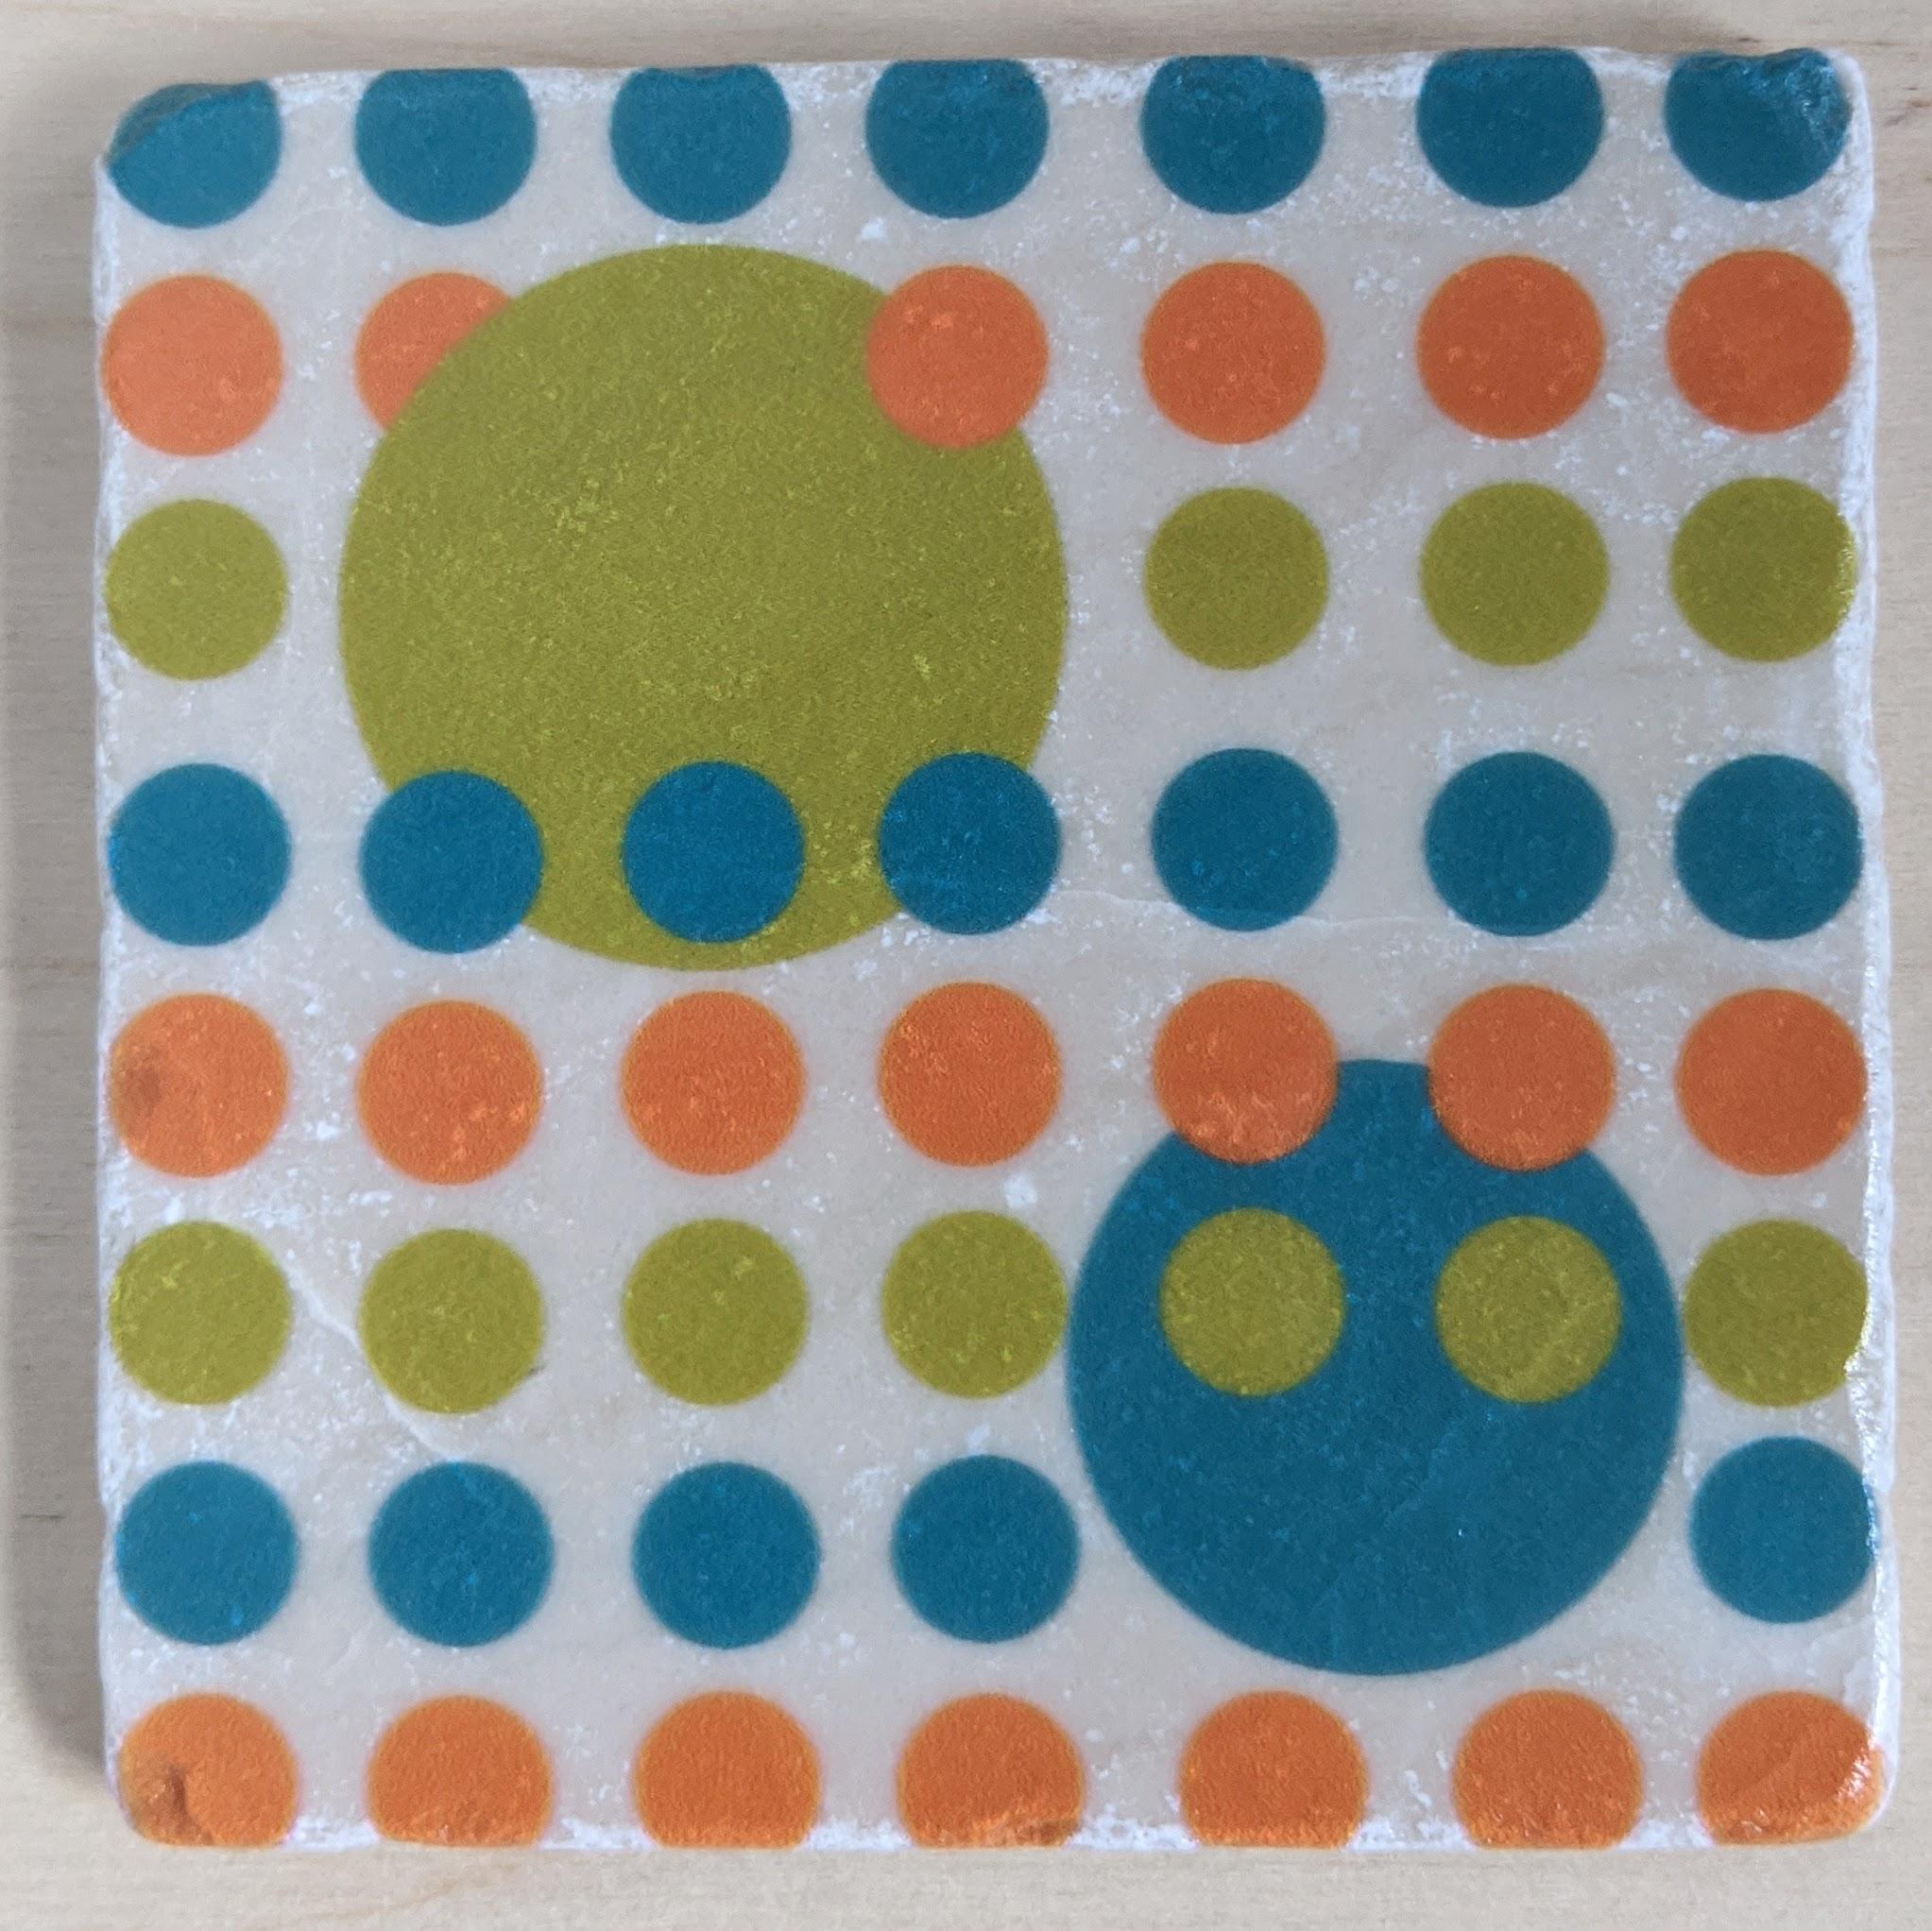 MCM-Marble Art Coasters Circles-04A-1